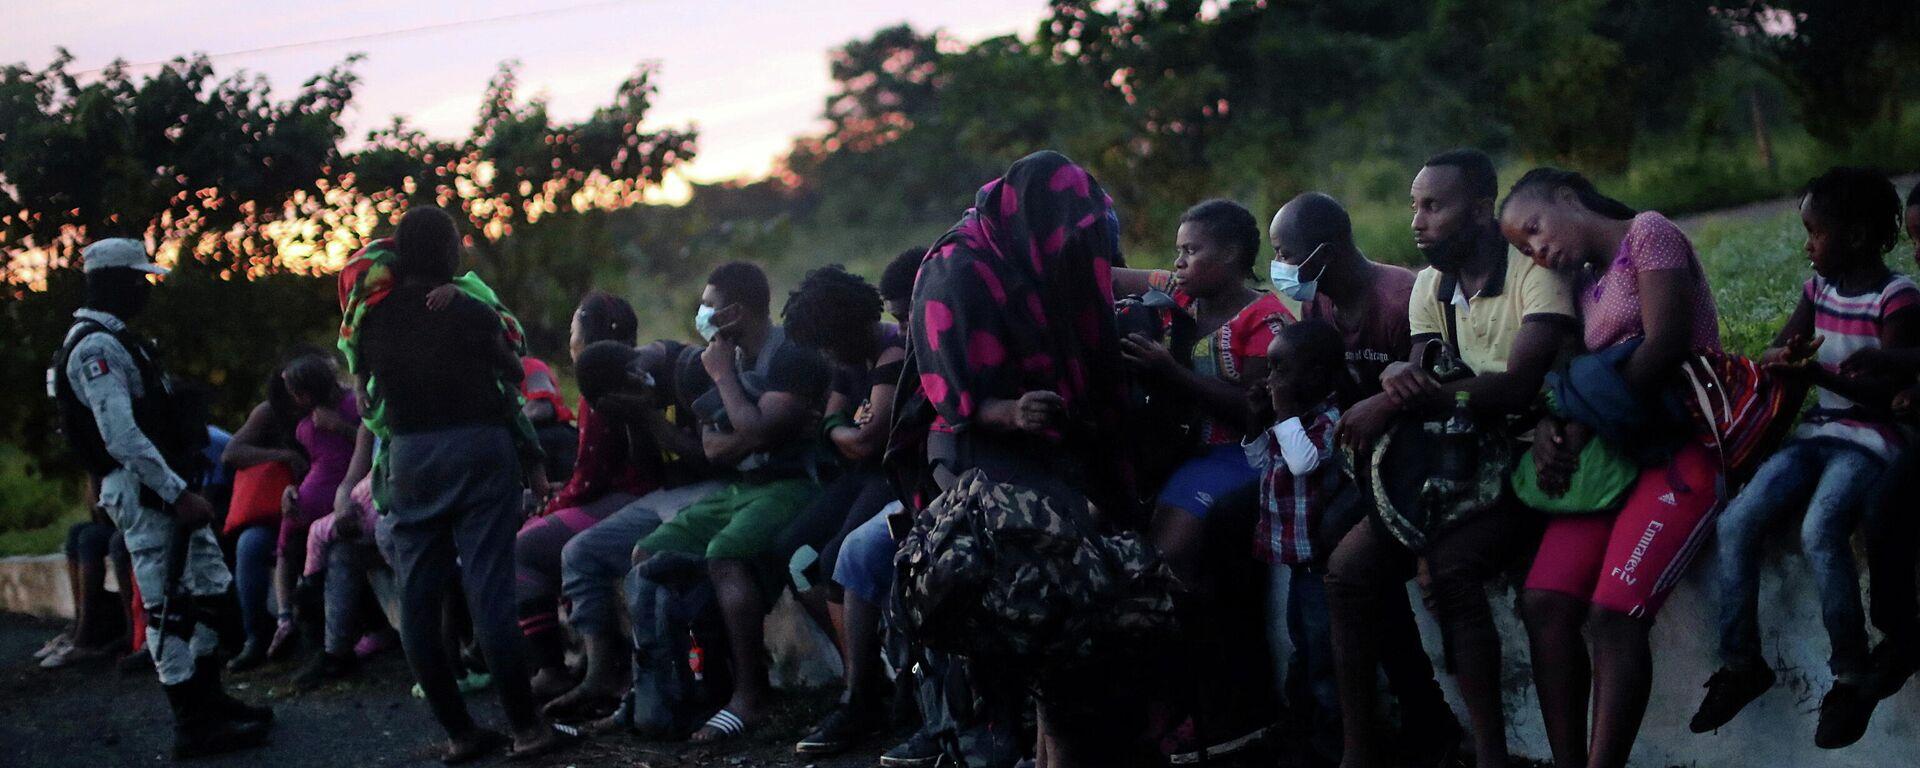 Migrantes haitianos - Sputnik Mundo, 1920, 25.09.2021